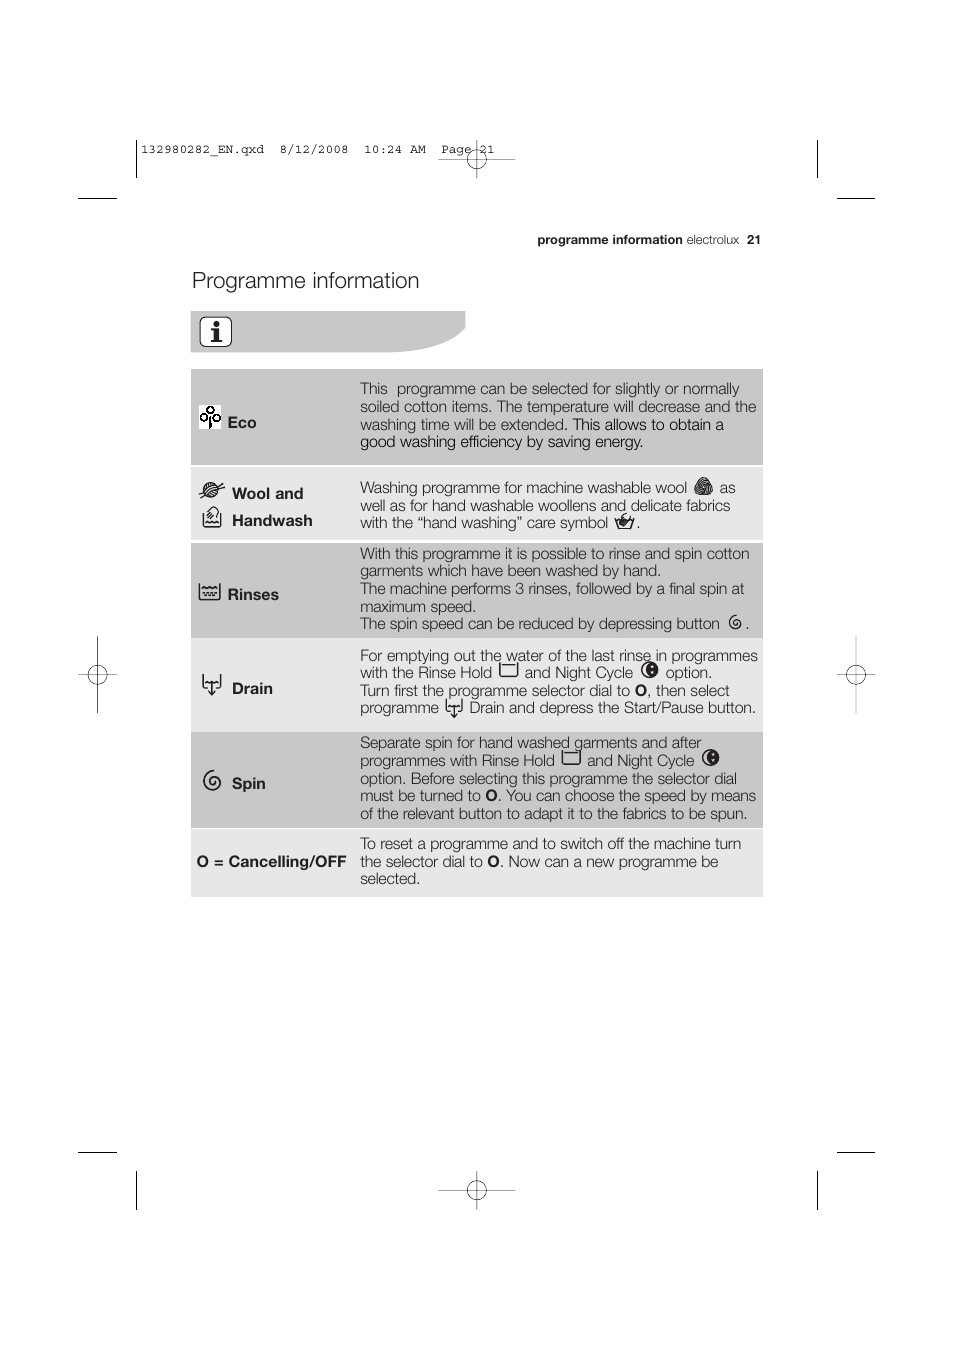 Programme information | Electrolux EWF 12040 W User Manual | Page 21